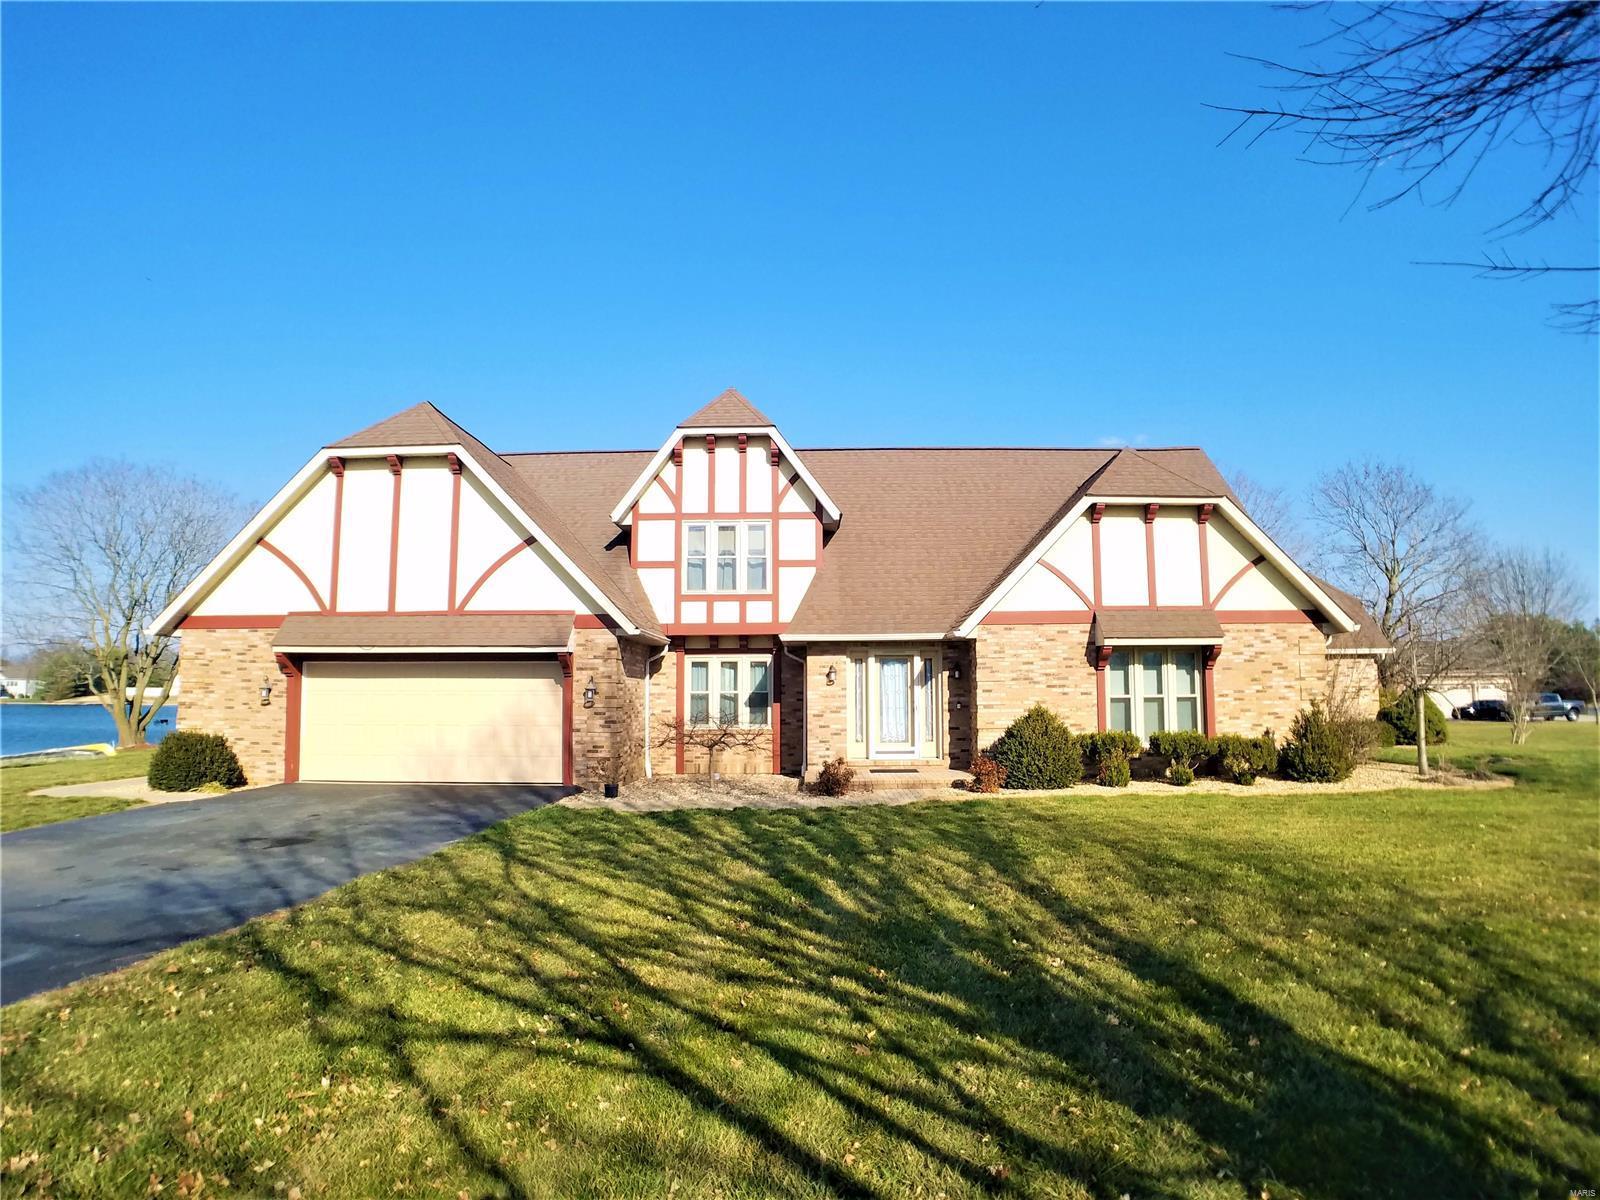 4036 Chestnut Oak Drive Property Photo - Smithton, IL real estate listing